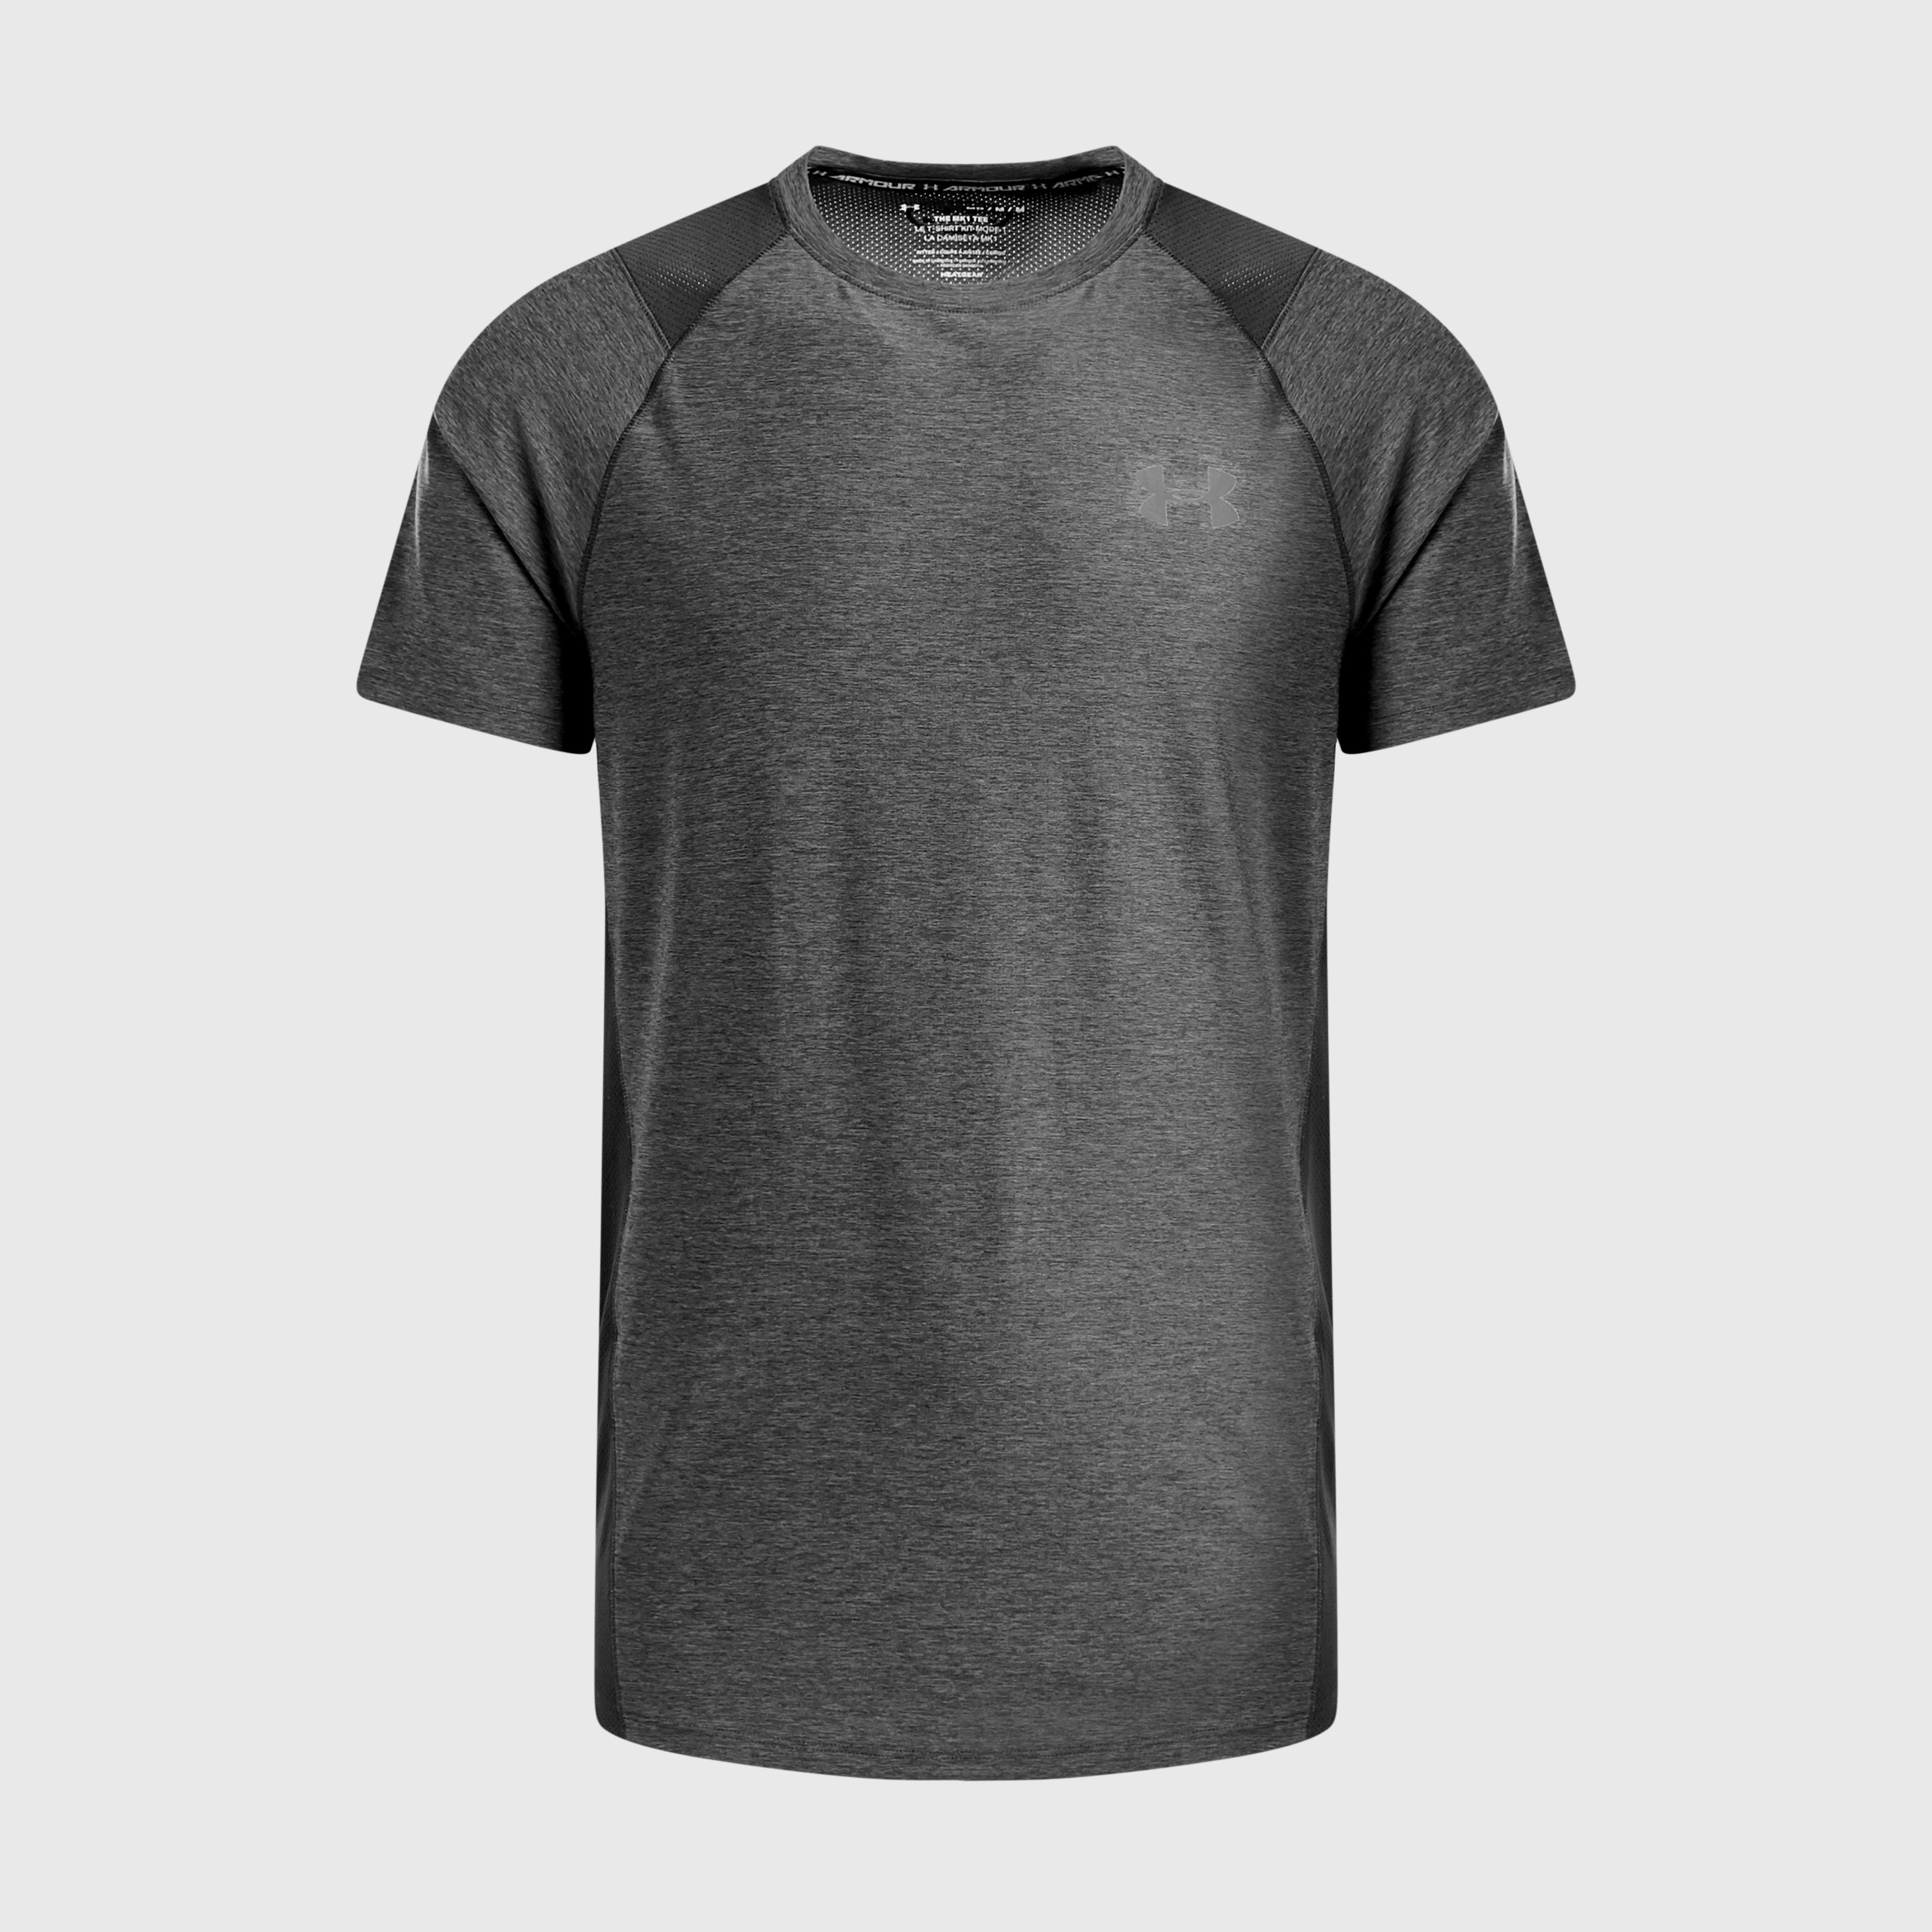 Under Armour Under Armour Mens MK-1 Twist T-Shirt, Black